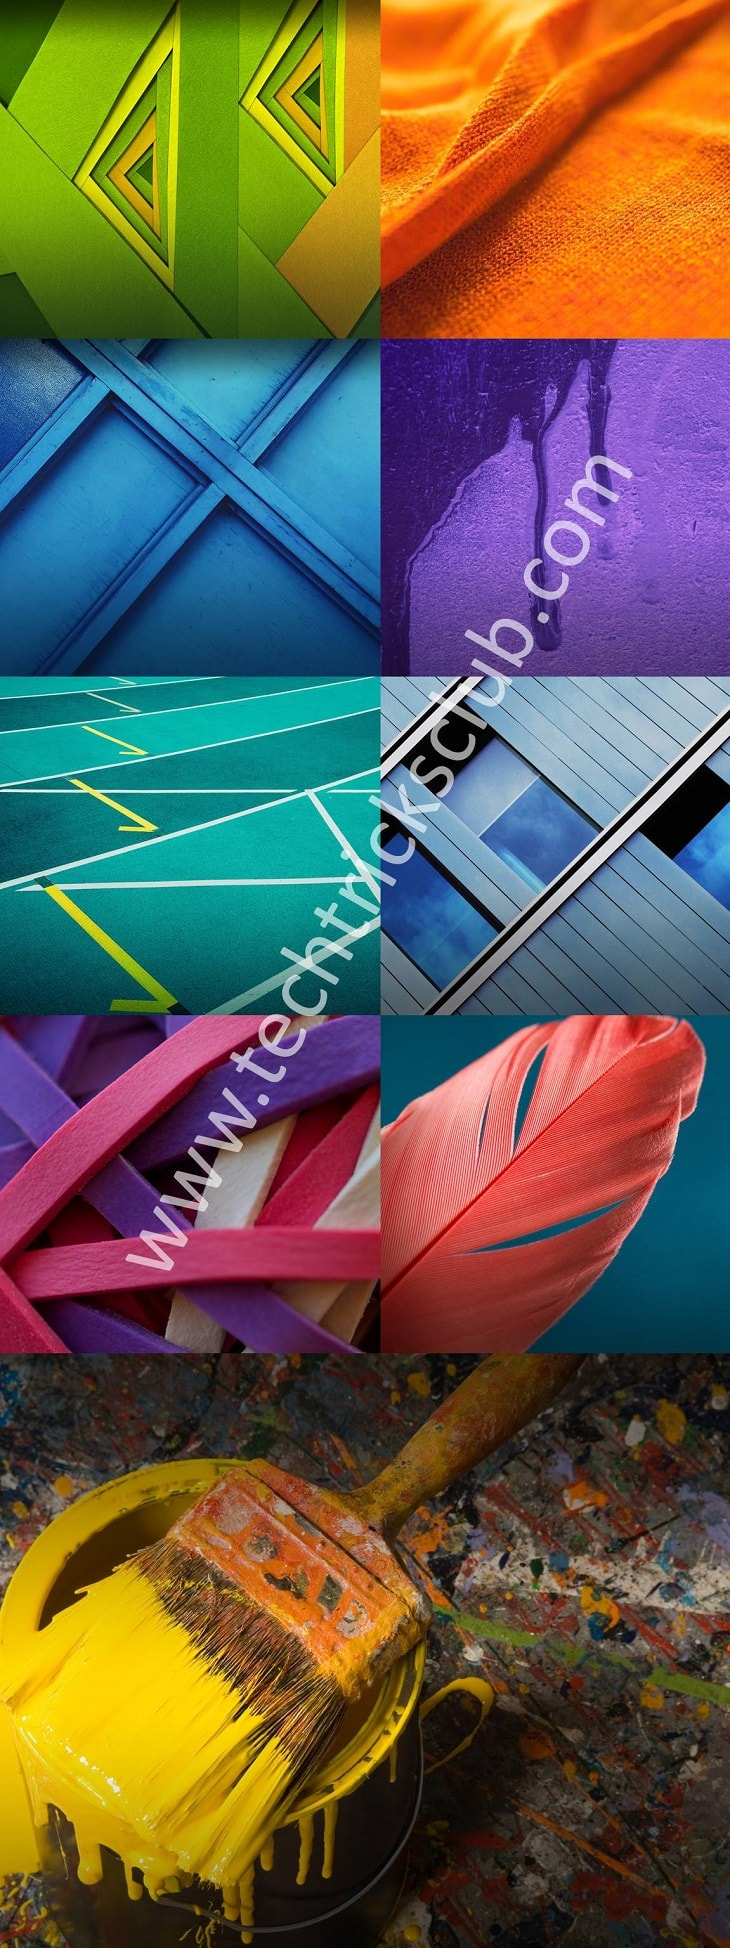 Motorola Moto X Wallpaper Download